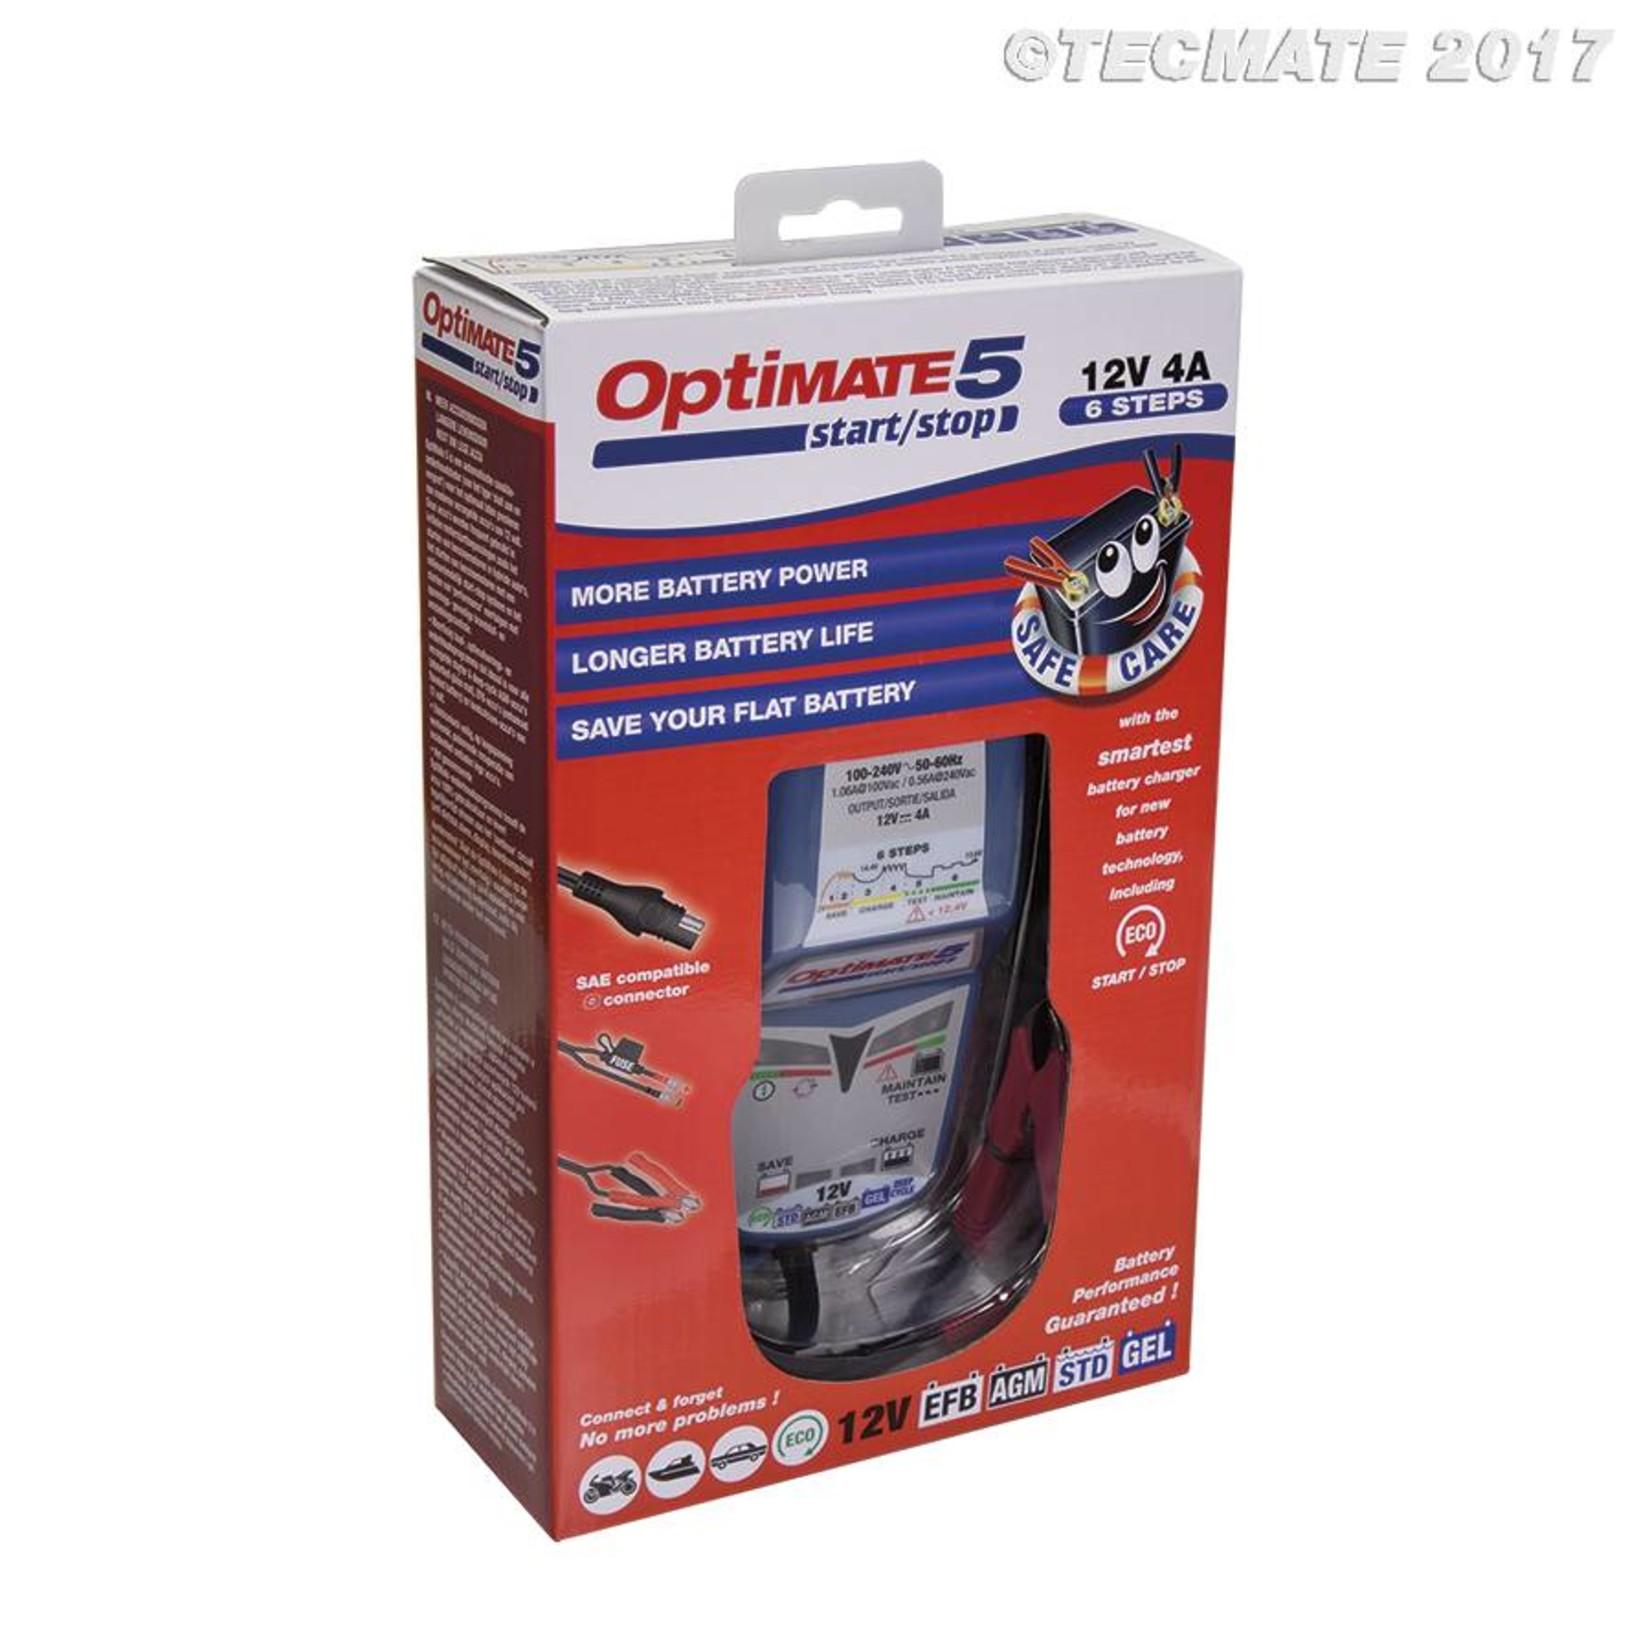 OptiMate OptiMate 5 - Acculader start/stop 12V